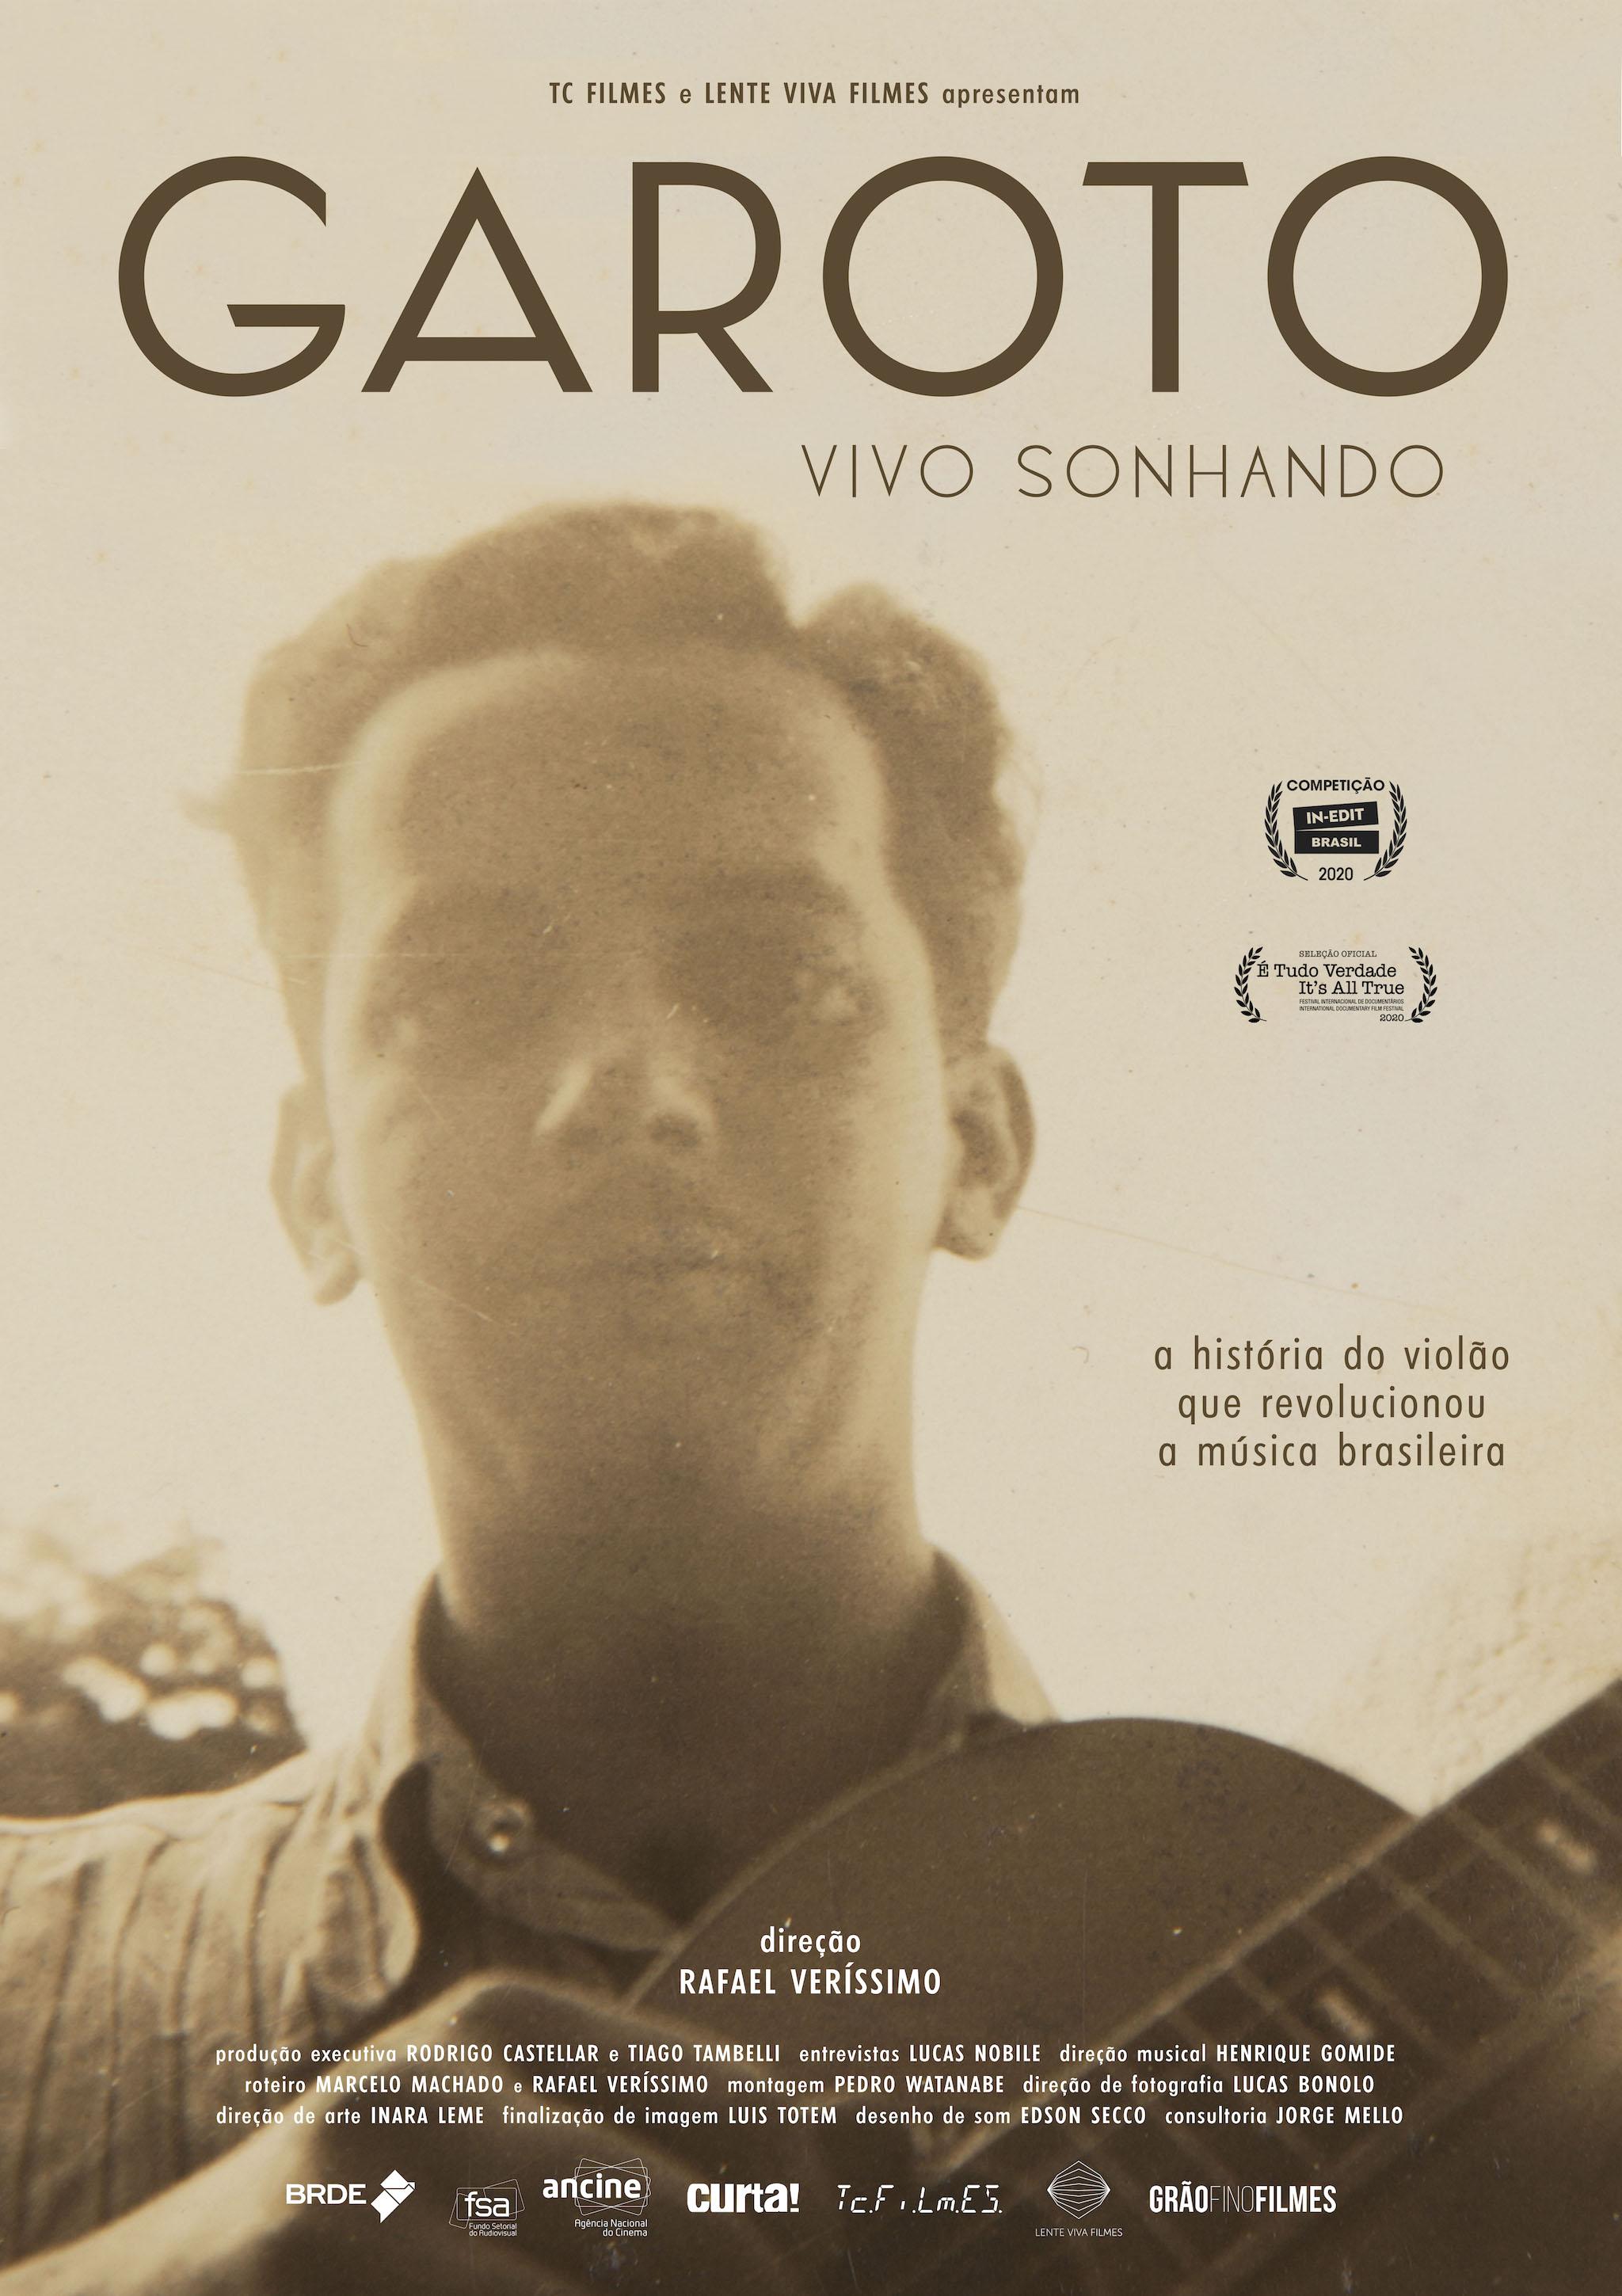 Garoto – Vivo Sonhando